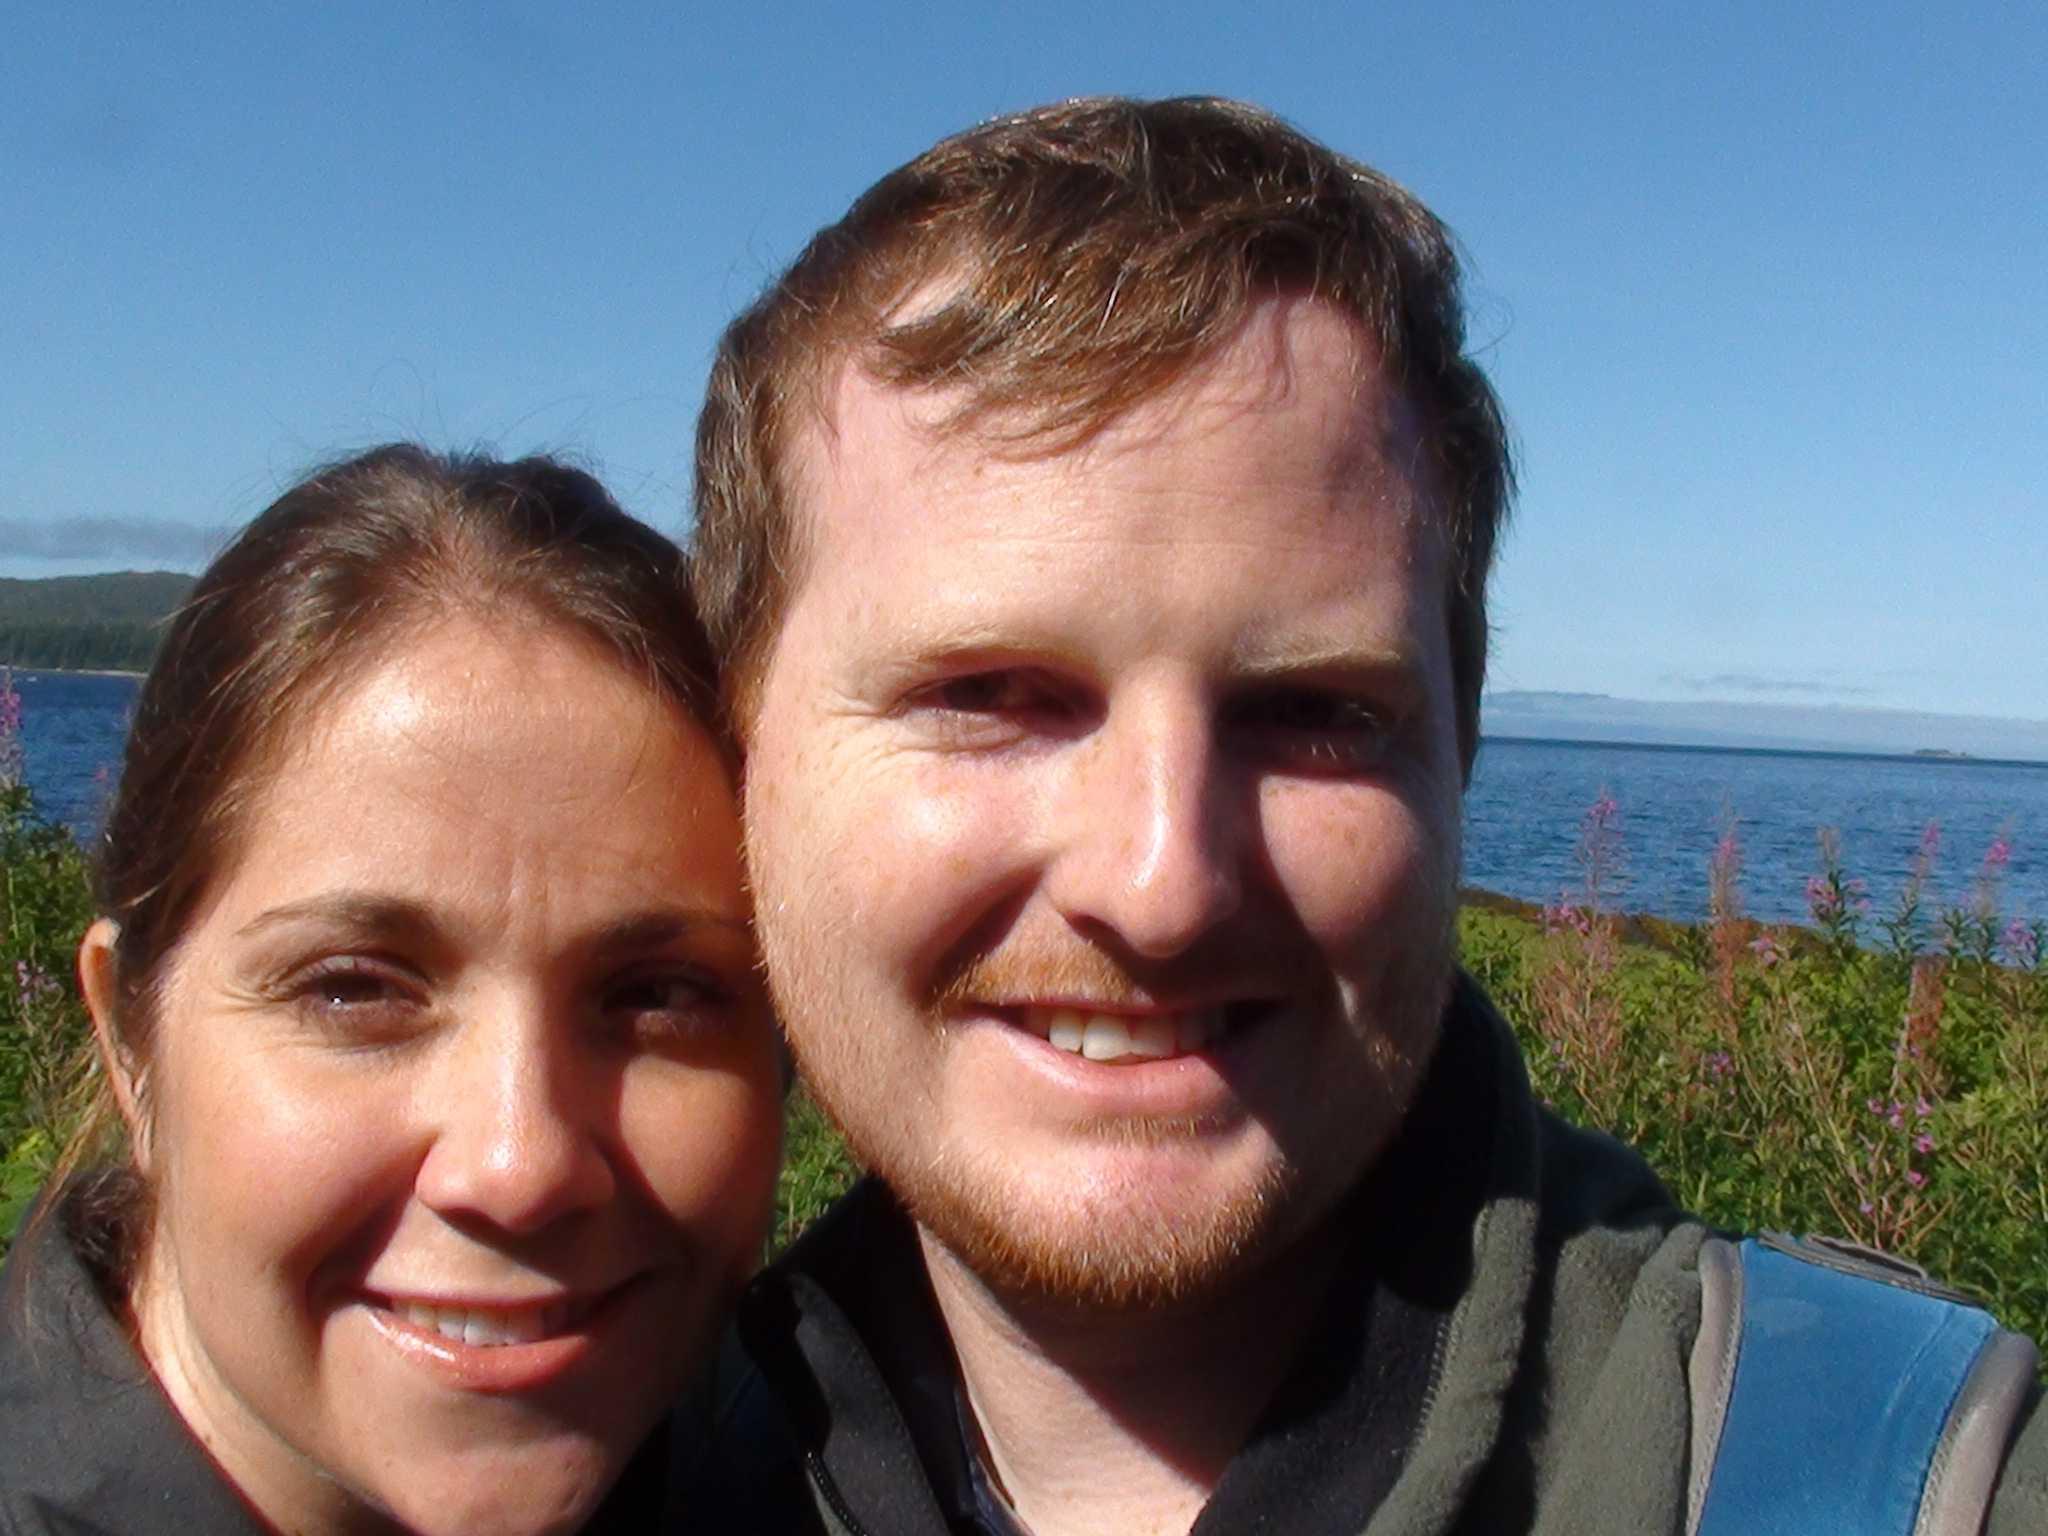 David Talcott with wife, Susie, in Juneau, Ala.